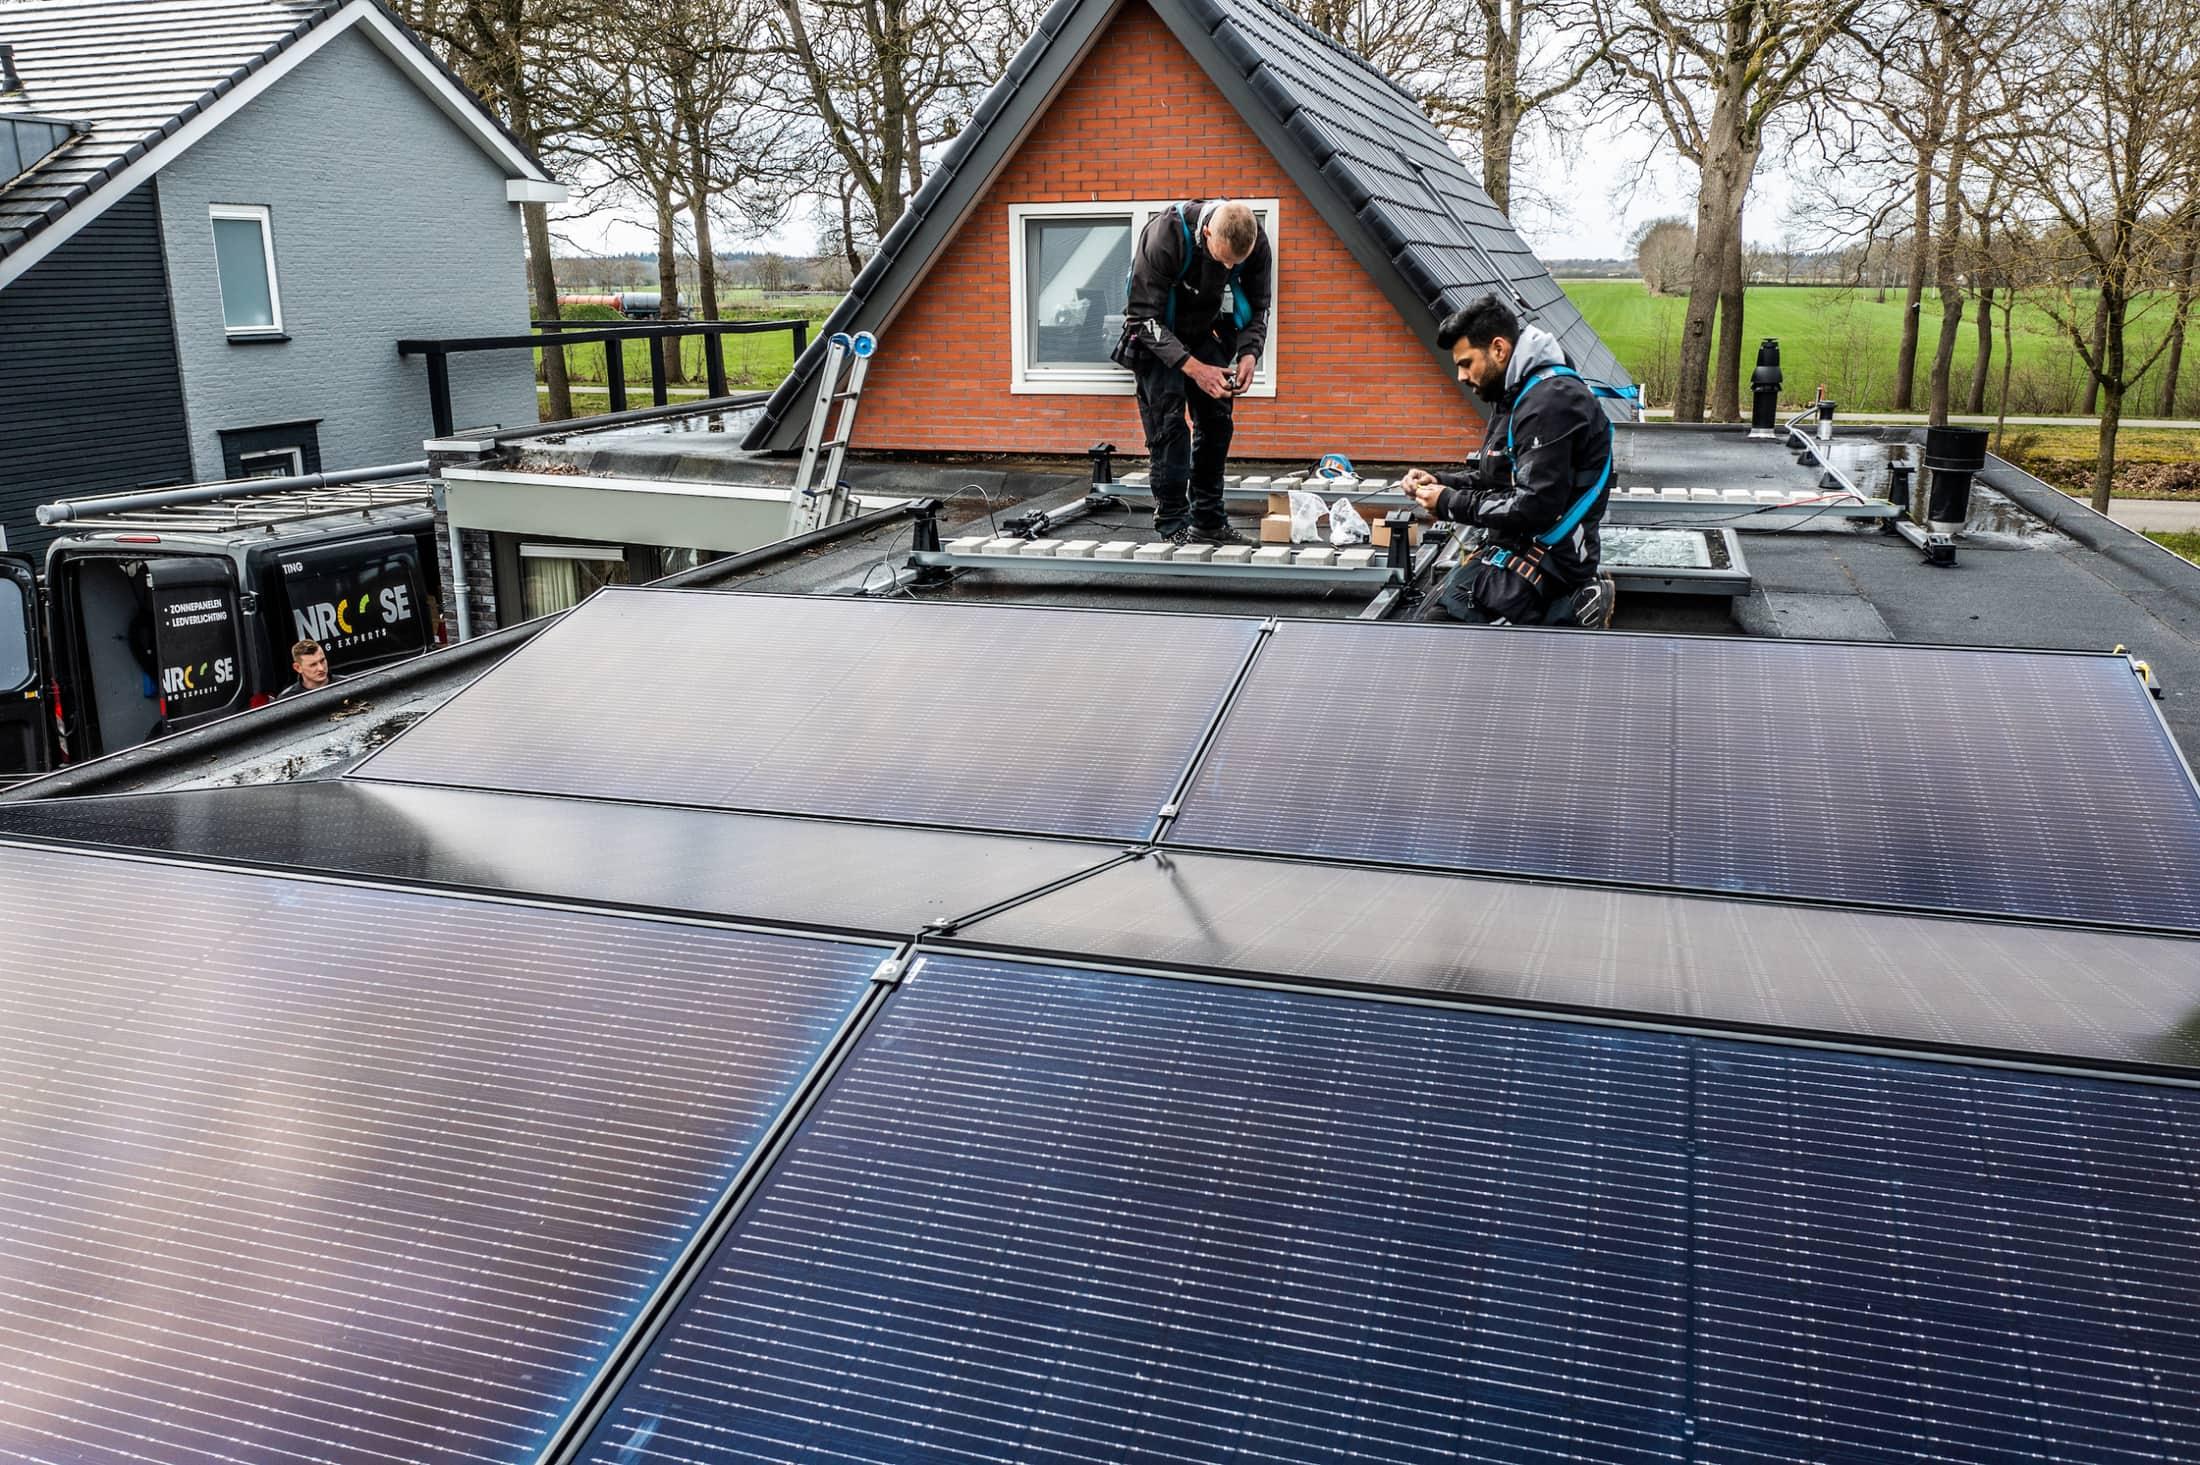 Kosten & opbrengsten zonnepanelen